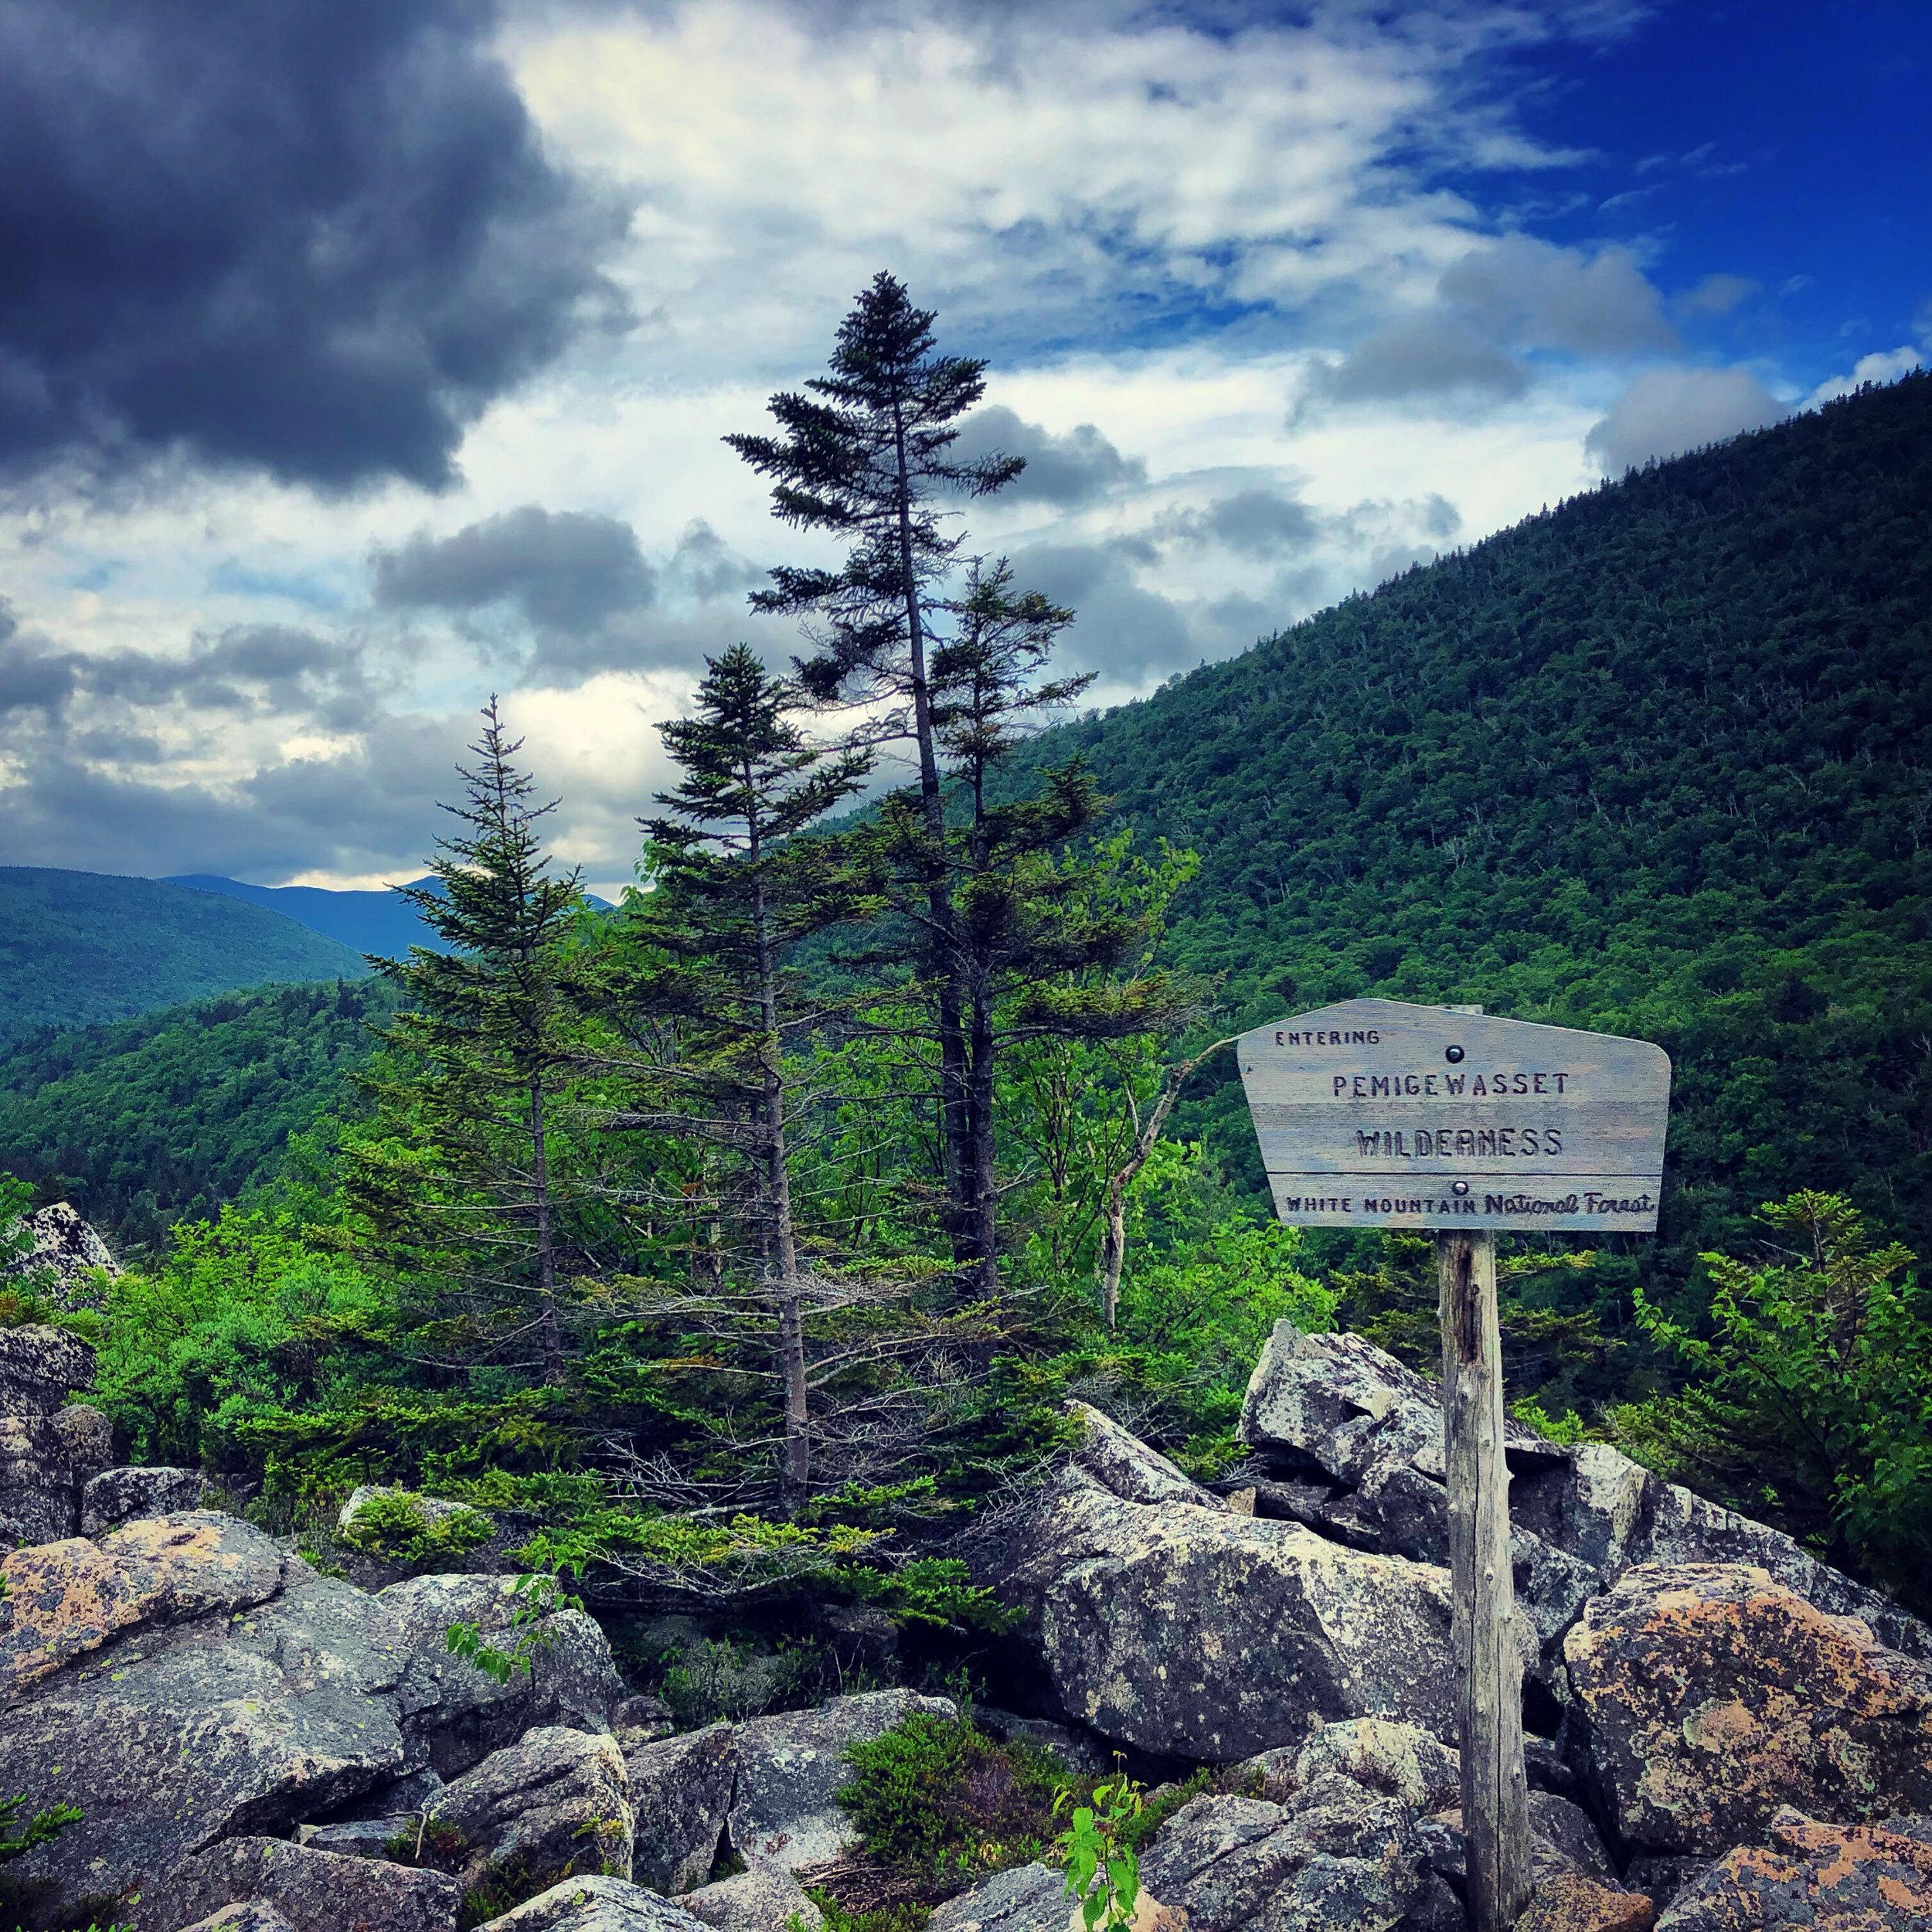 Entering the Pemigewasset Wilderness